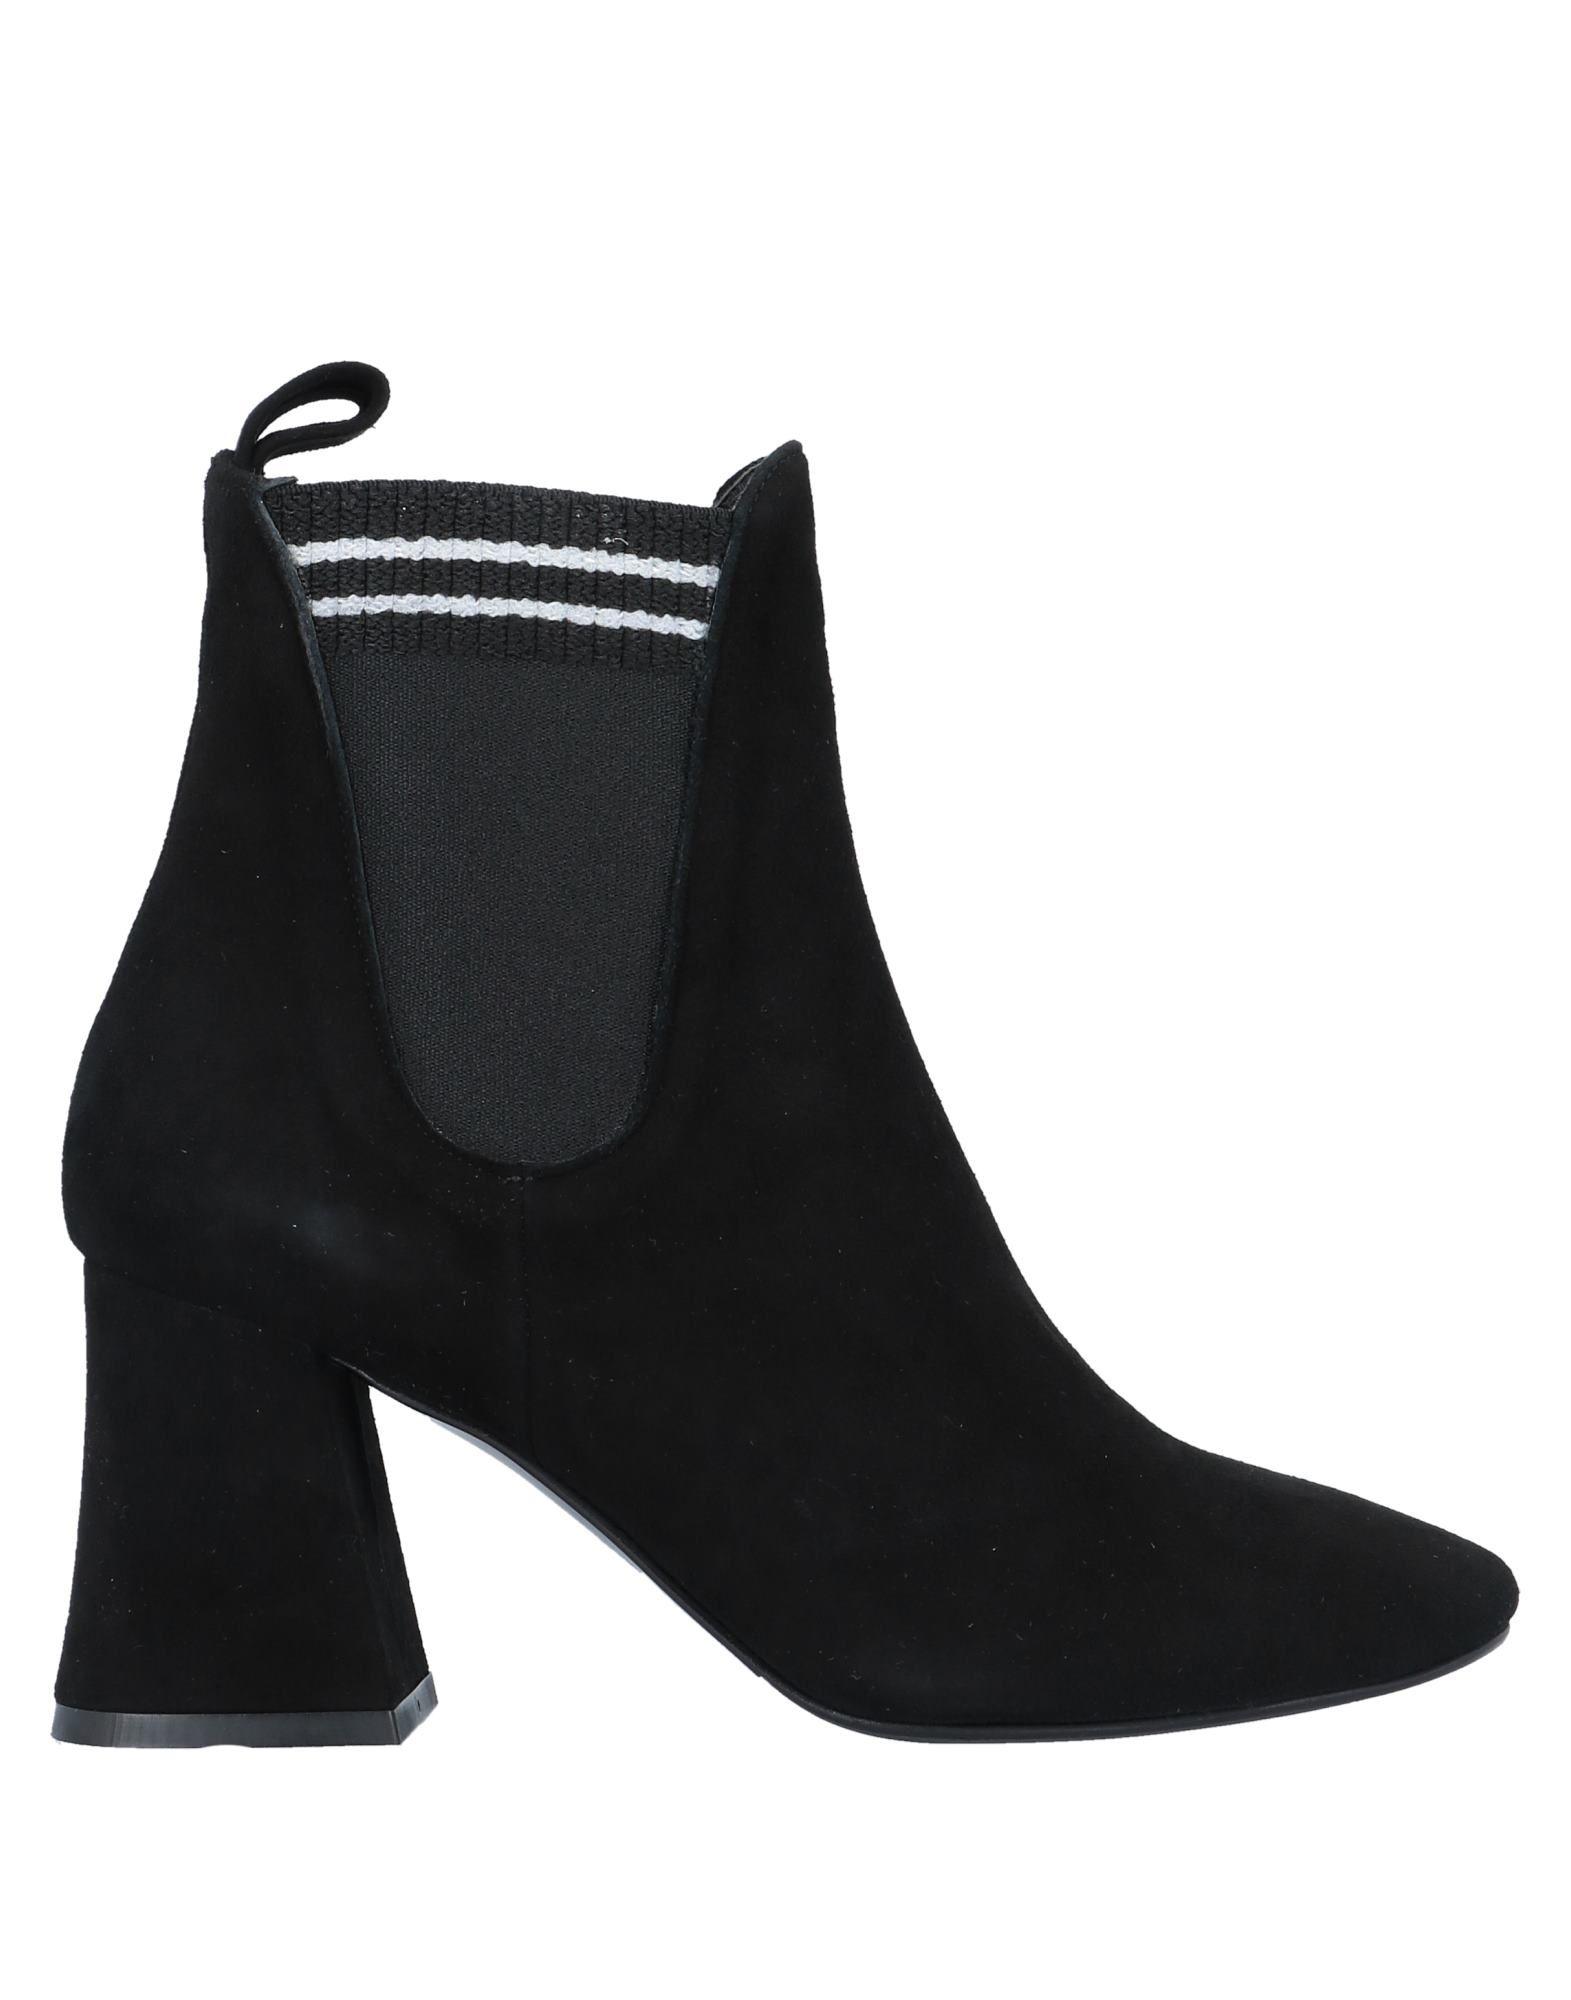 STEPHEN GOOD London Полусапоги и высокие ботинки lucy choi london полусапоги и высокие ботинки